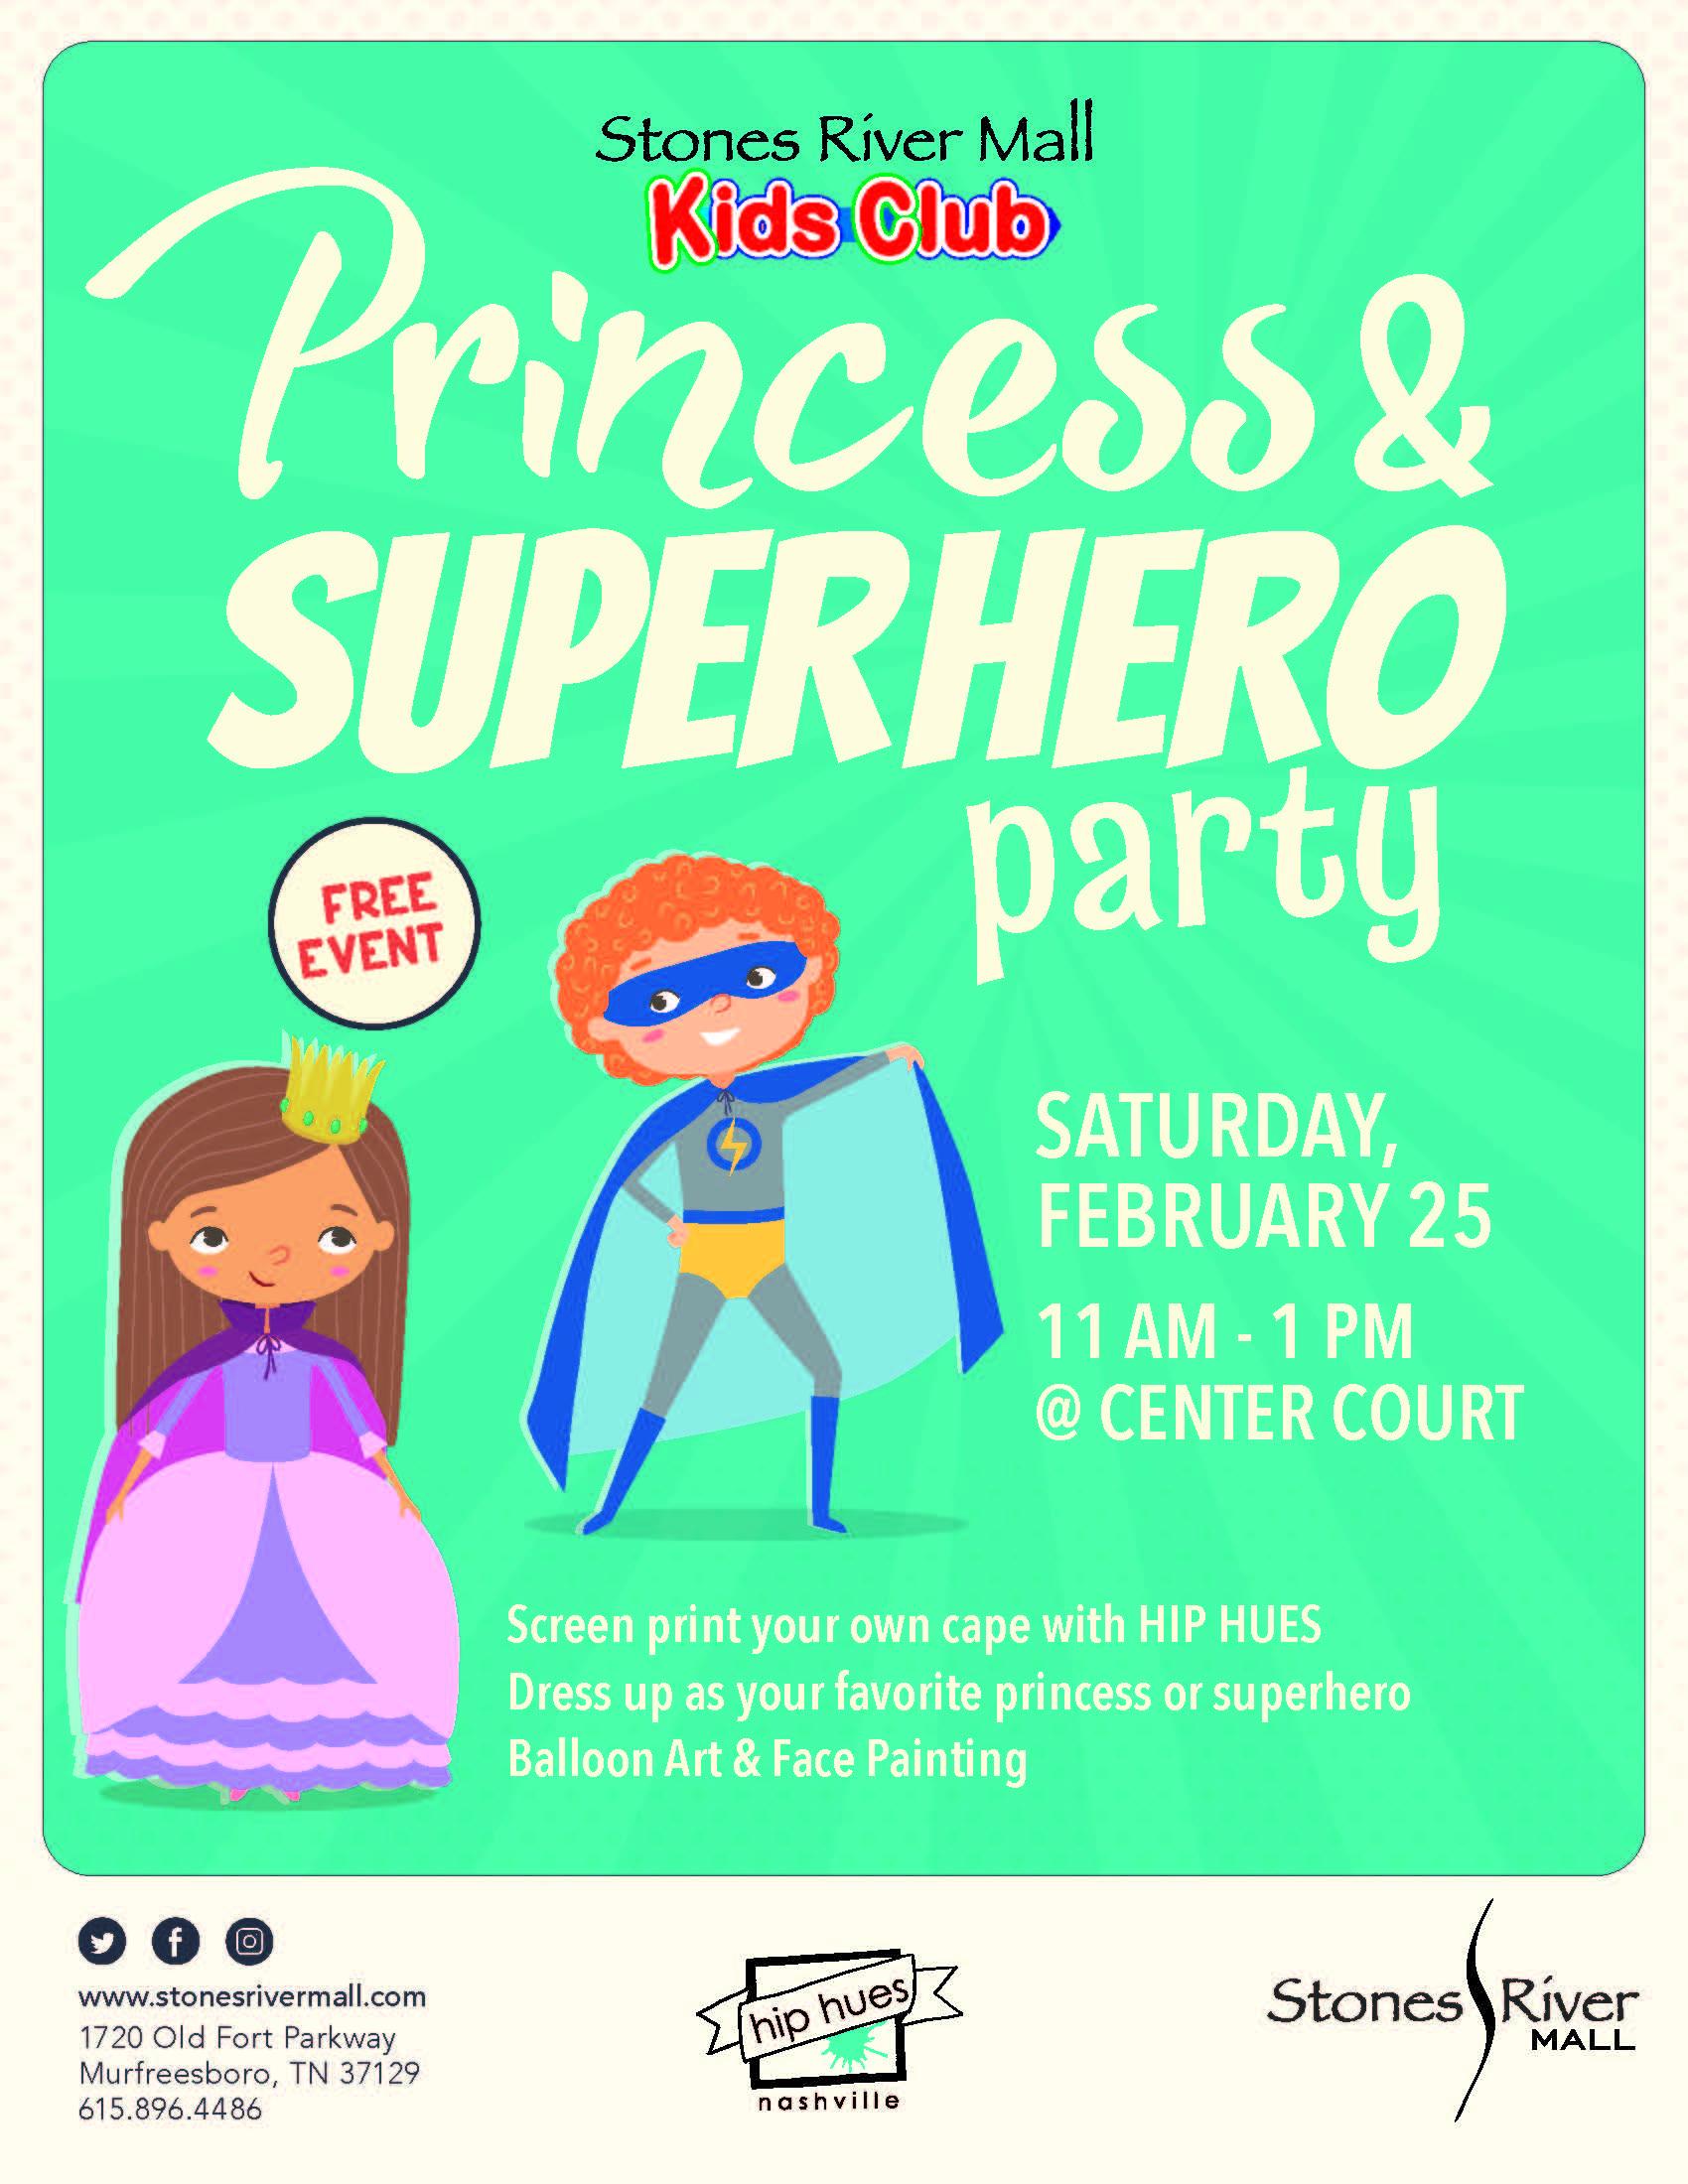 Stones River Mall presents Kids Club: Princess & Superhero Party on Feb. 25